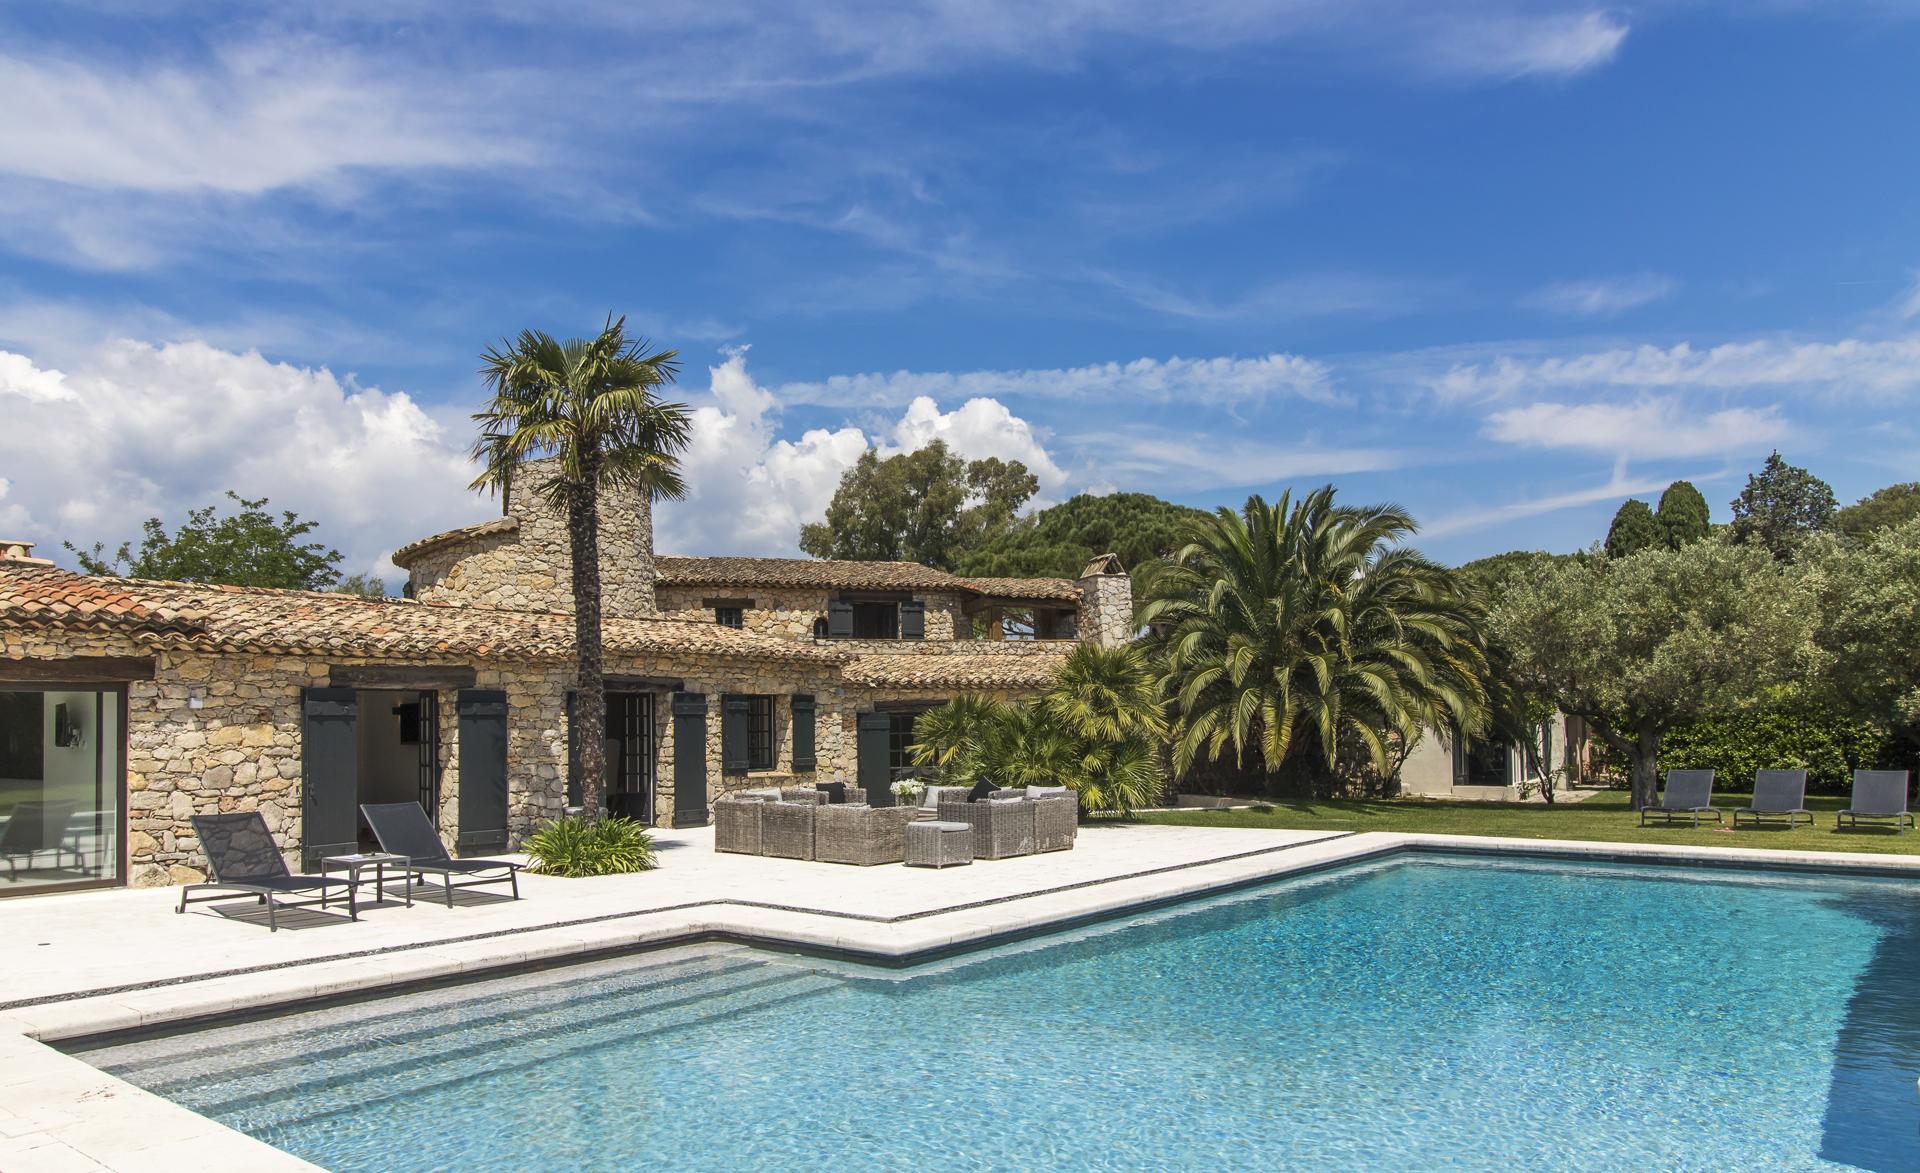 Outdoor pool and villa exterior, Belle de Gassin, St Tropez Var, Gassin.